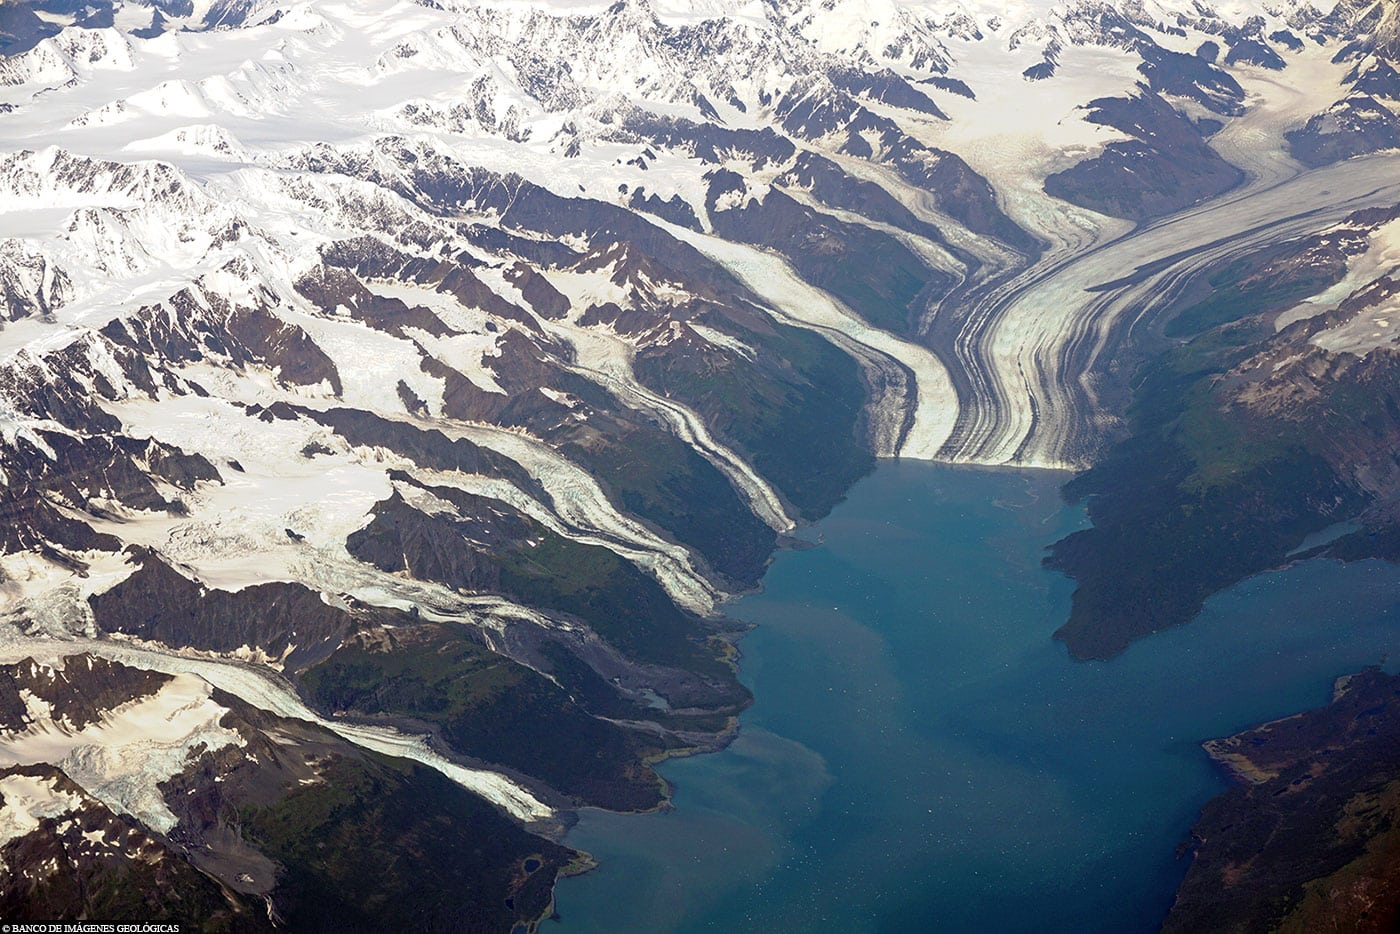 Alaska, College Fjord, Luftbild, USA, Reisebericht, Princess Cruises, Kreuzfahrt